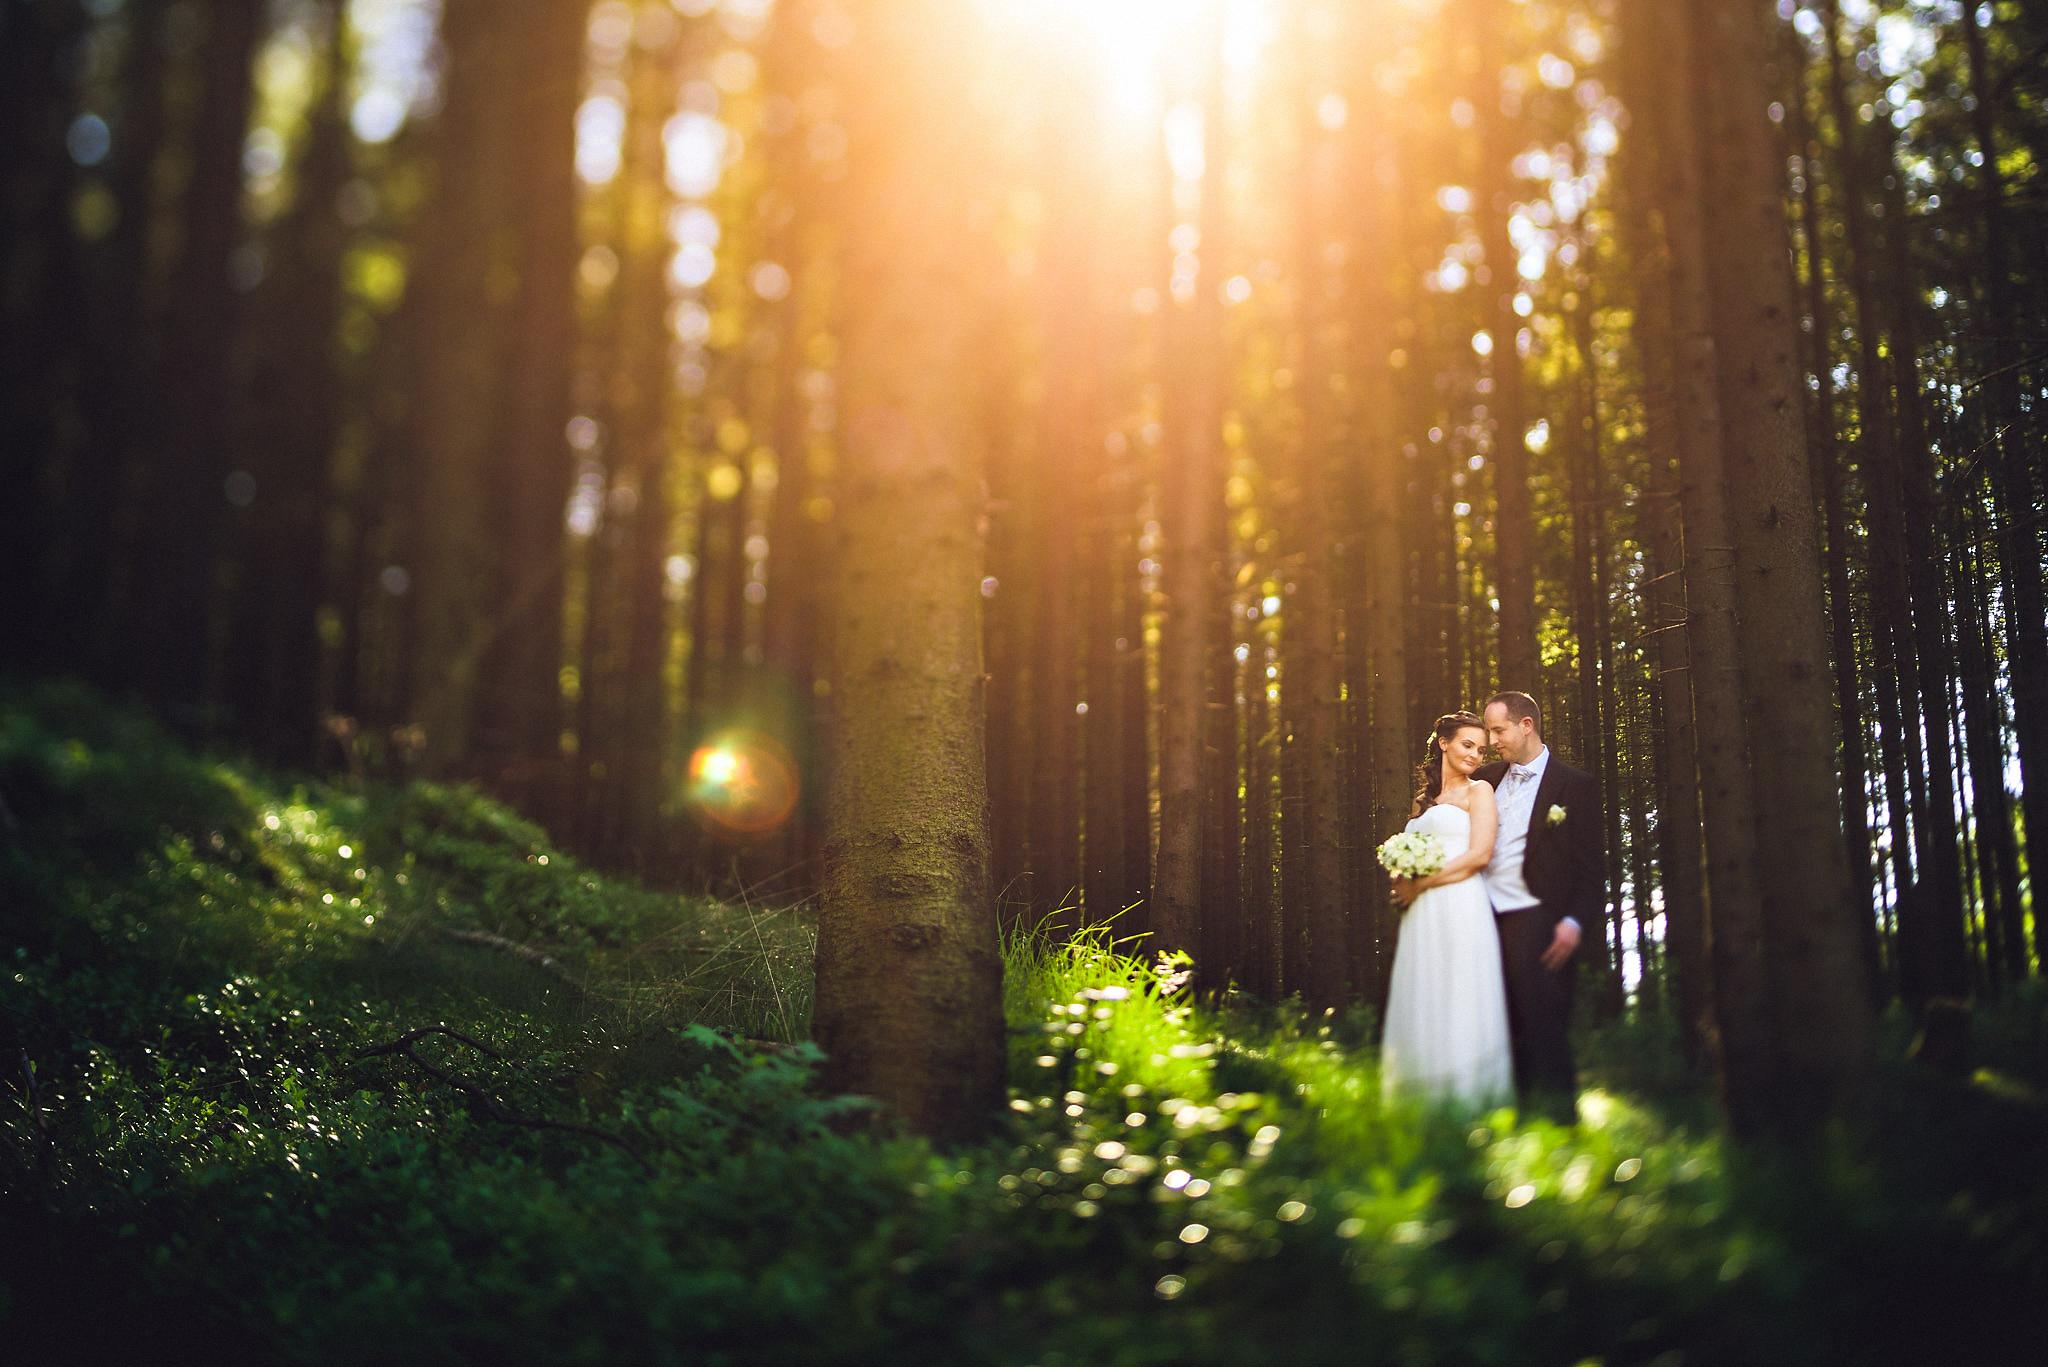 Eirik Halvorsen Blikkfangerne intervju bryllupsfotografer i norge 7.jpg